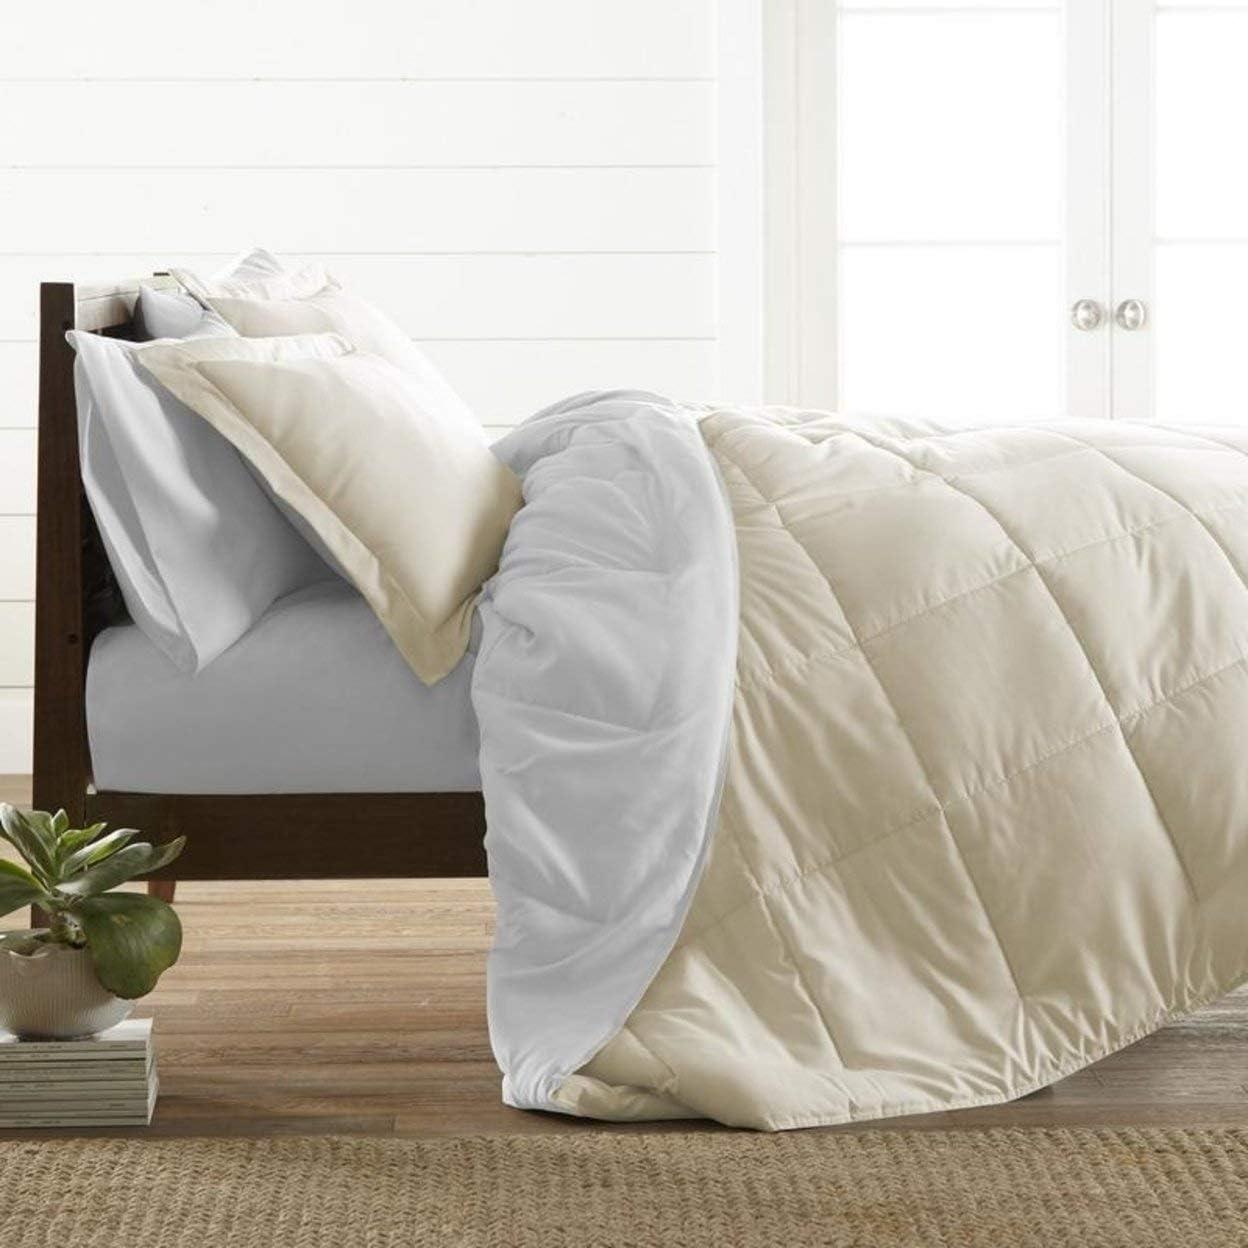 ienjoy Home Premium Down Alternative Reversible Comforter Set, Full/Queen, White